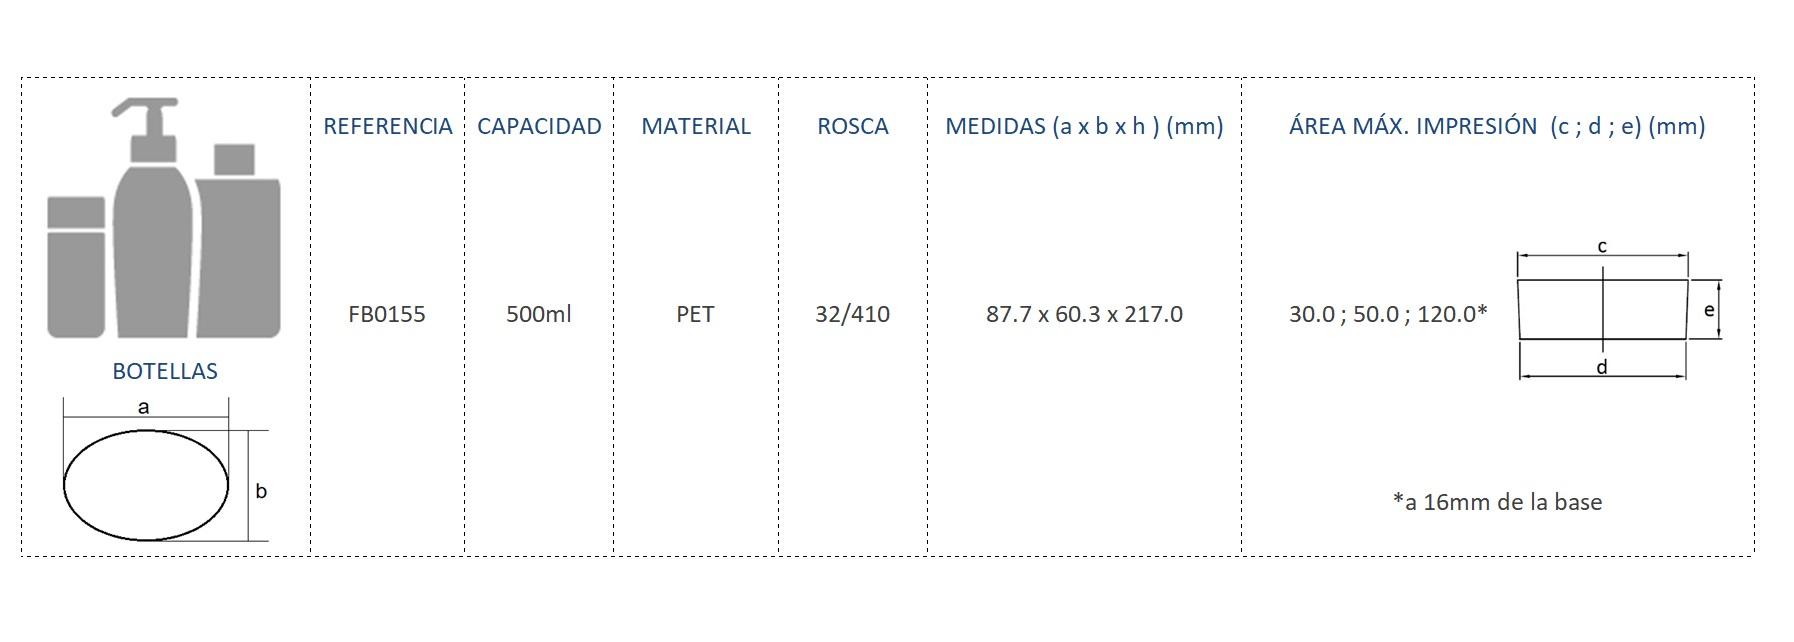 Cuadro de materiales botella FB0155